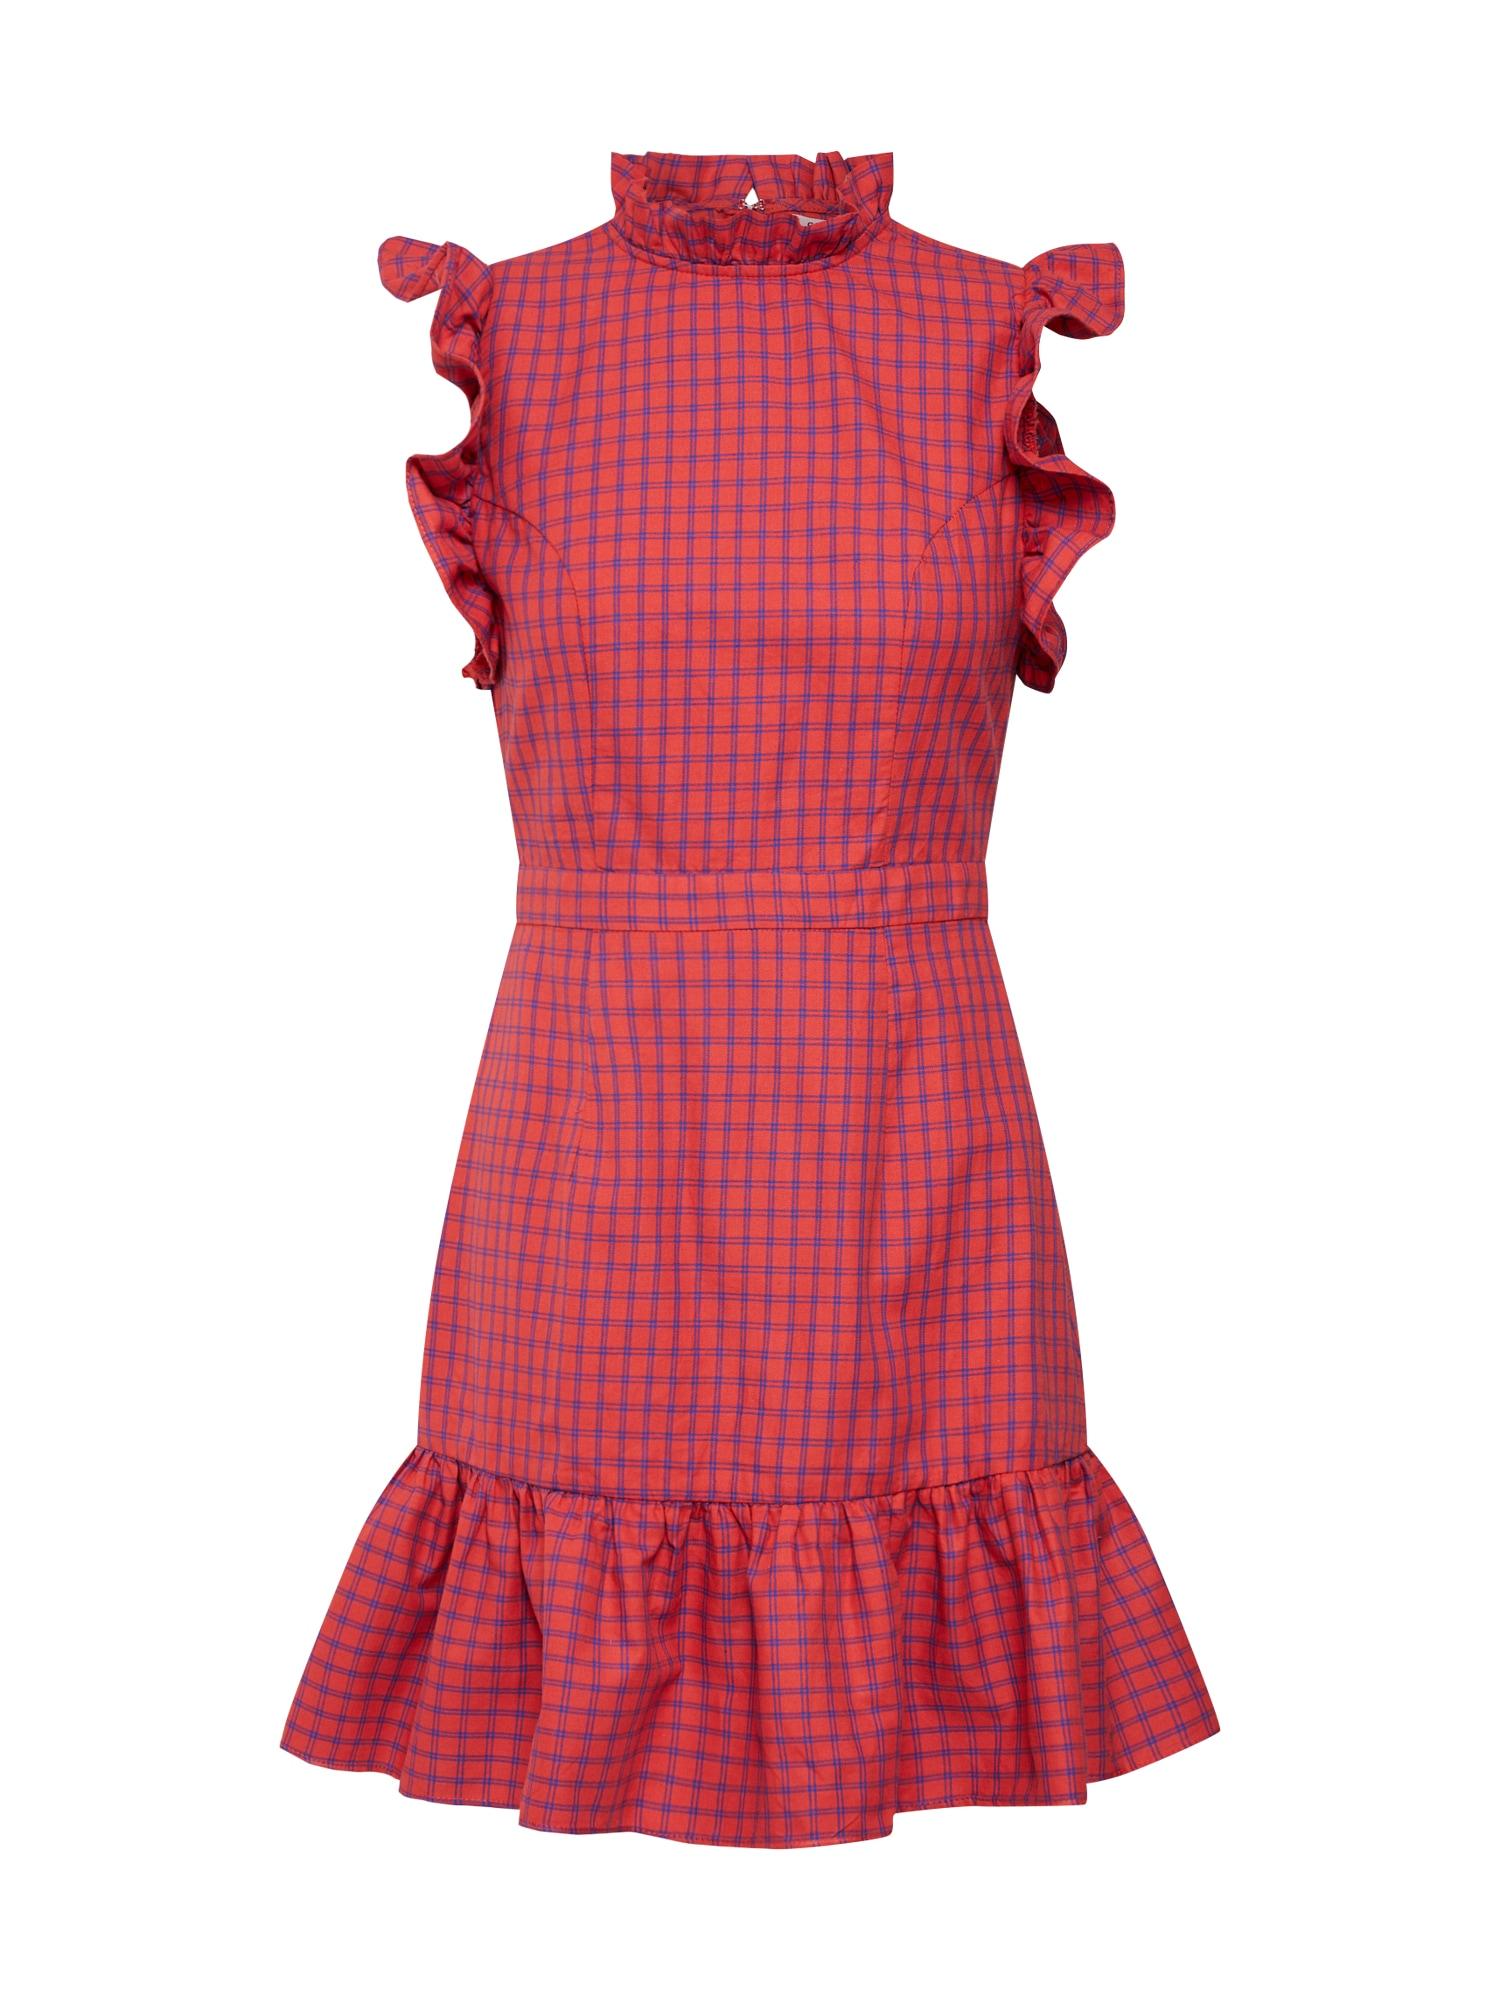 Šaty HP0539 modrá červená GLAMOROUS